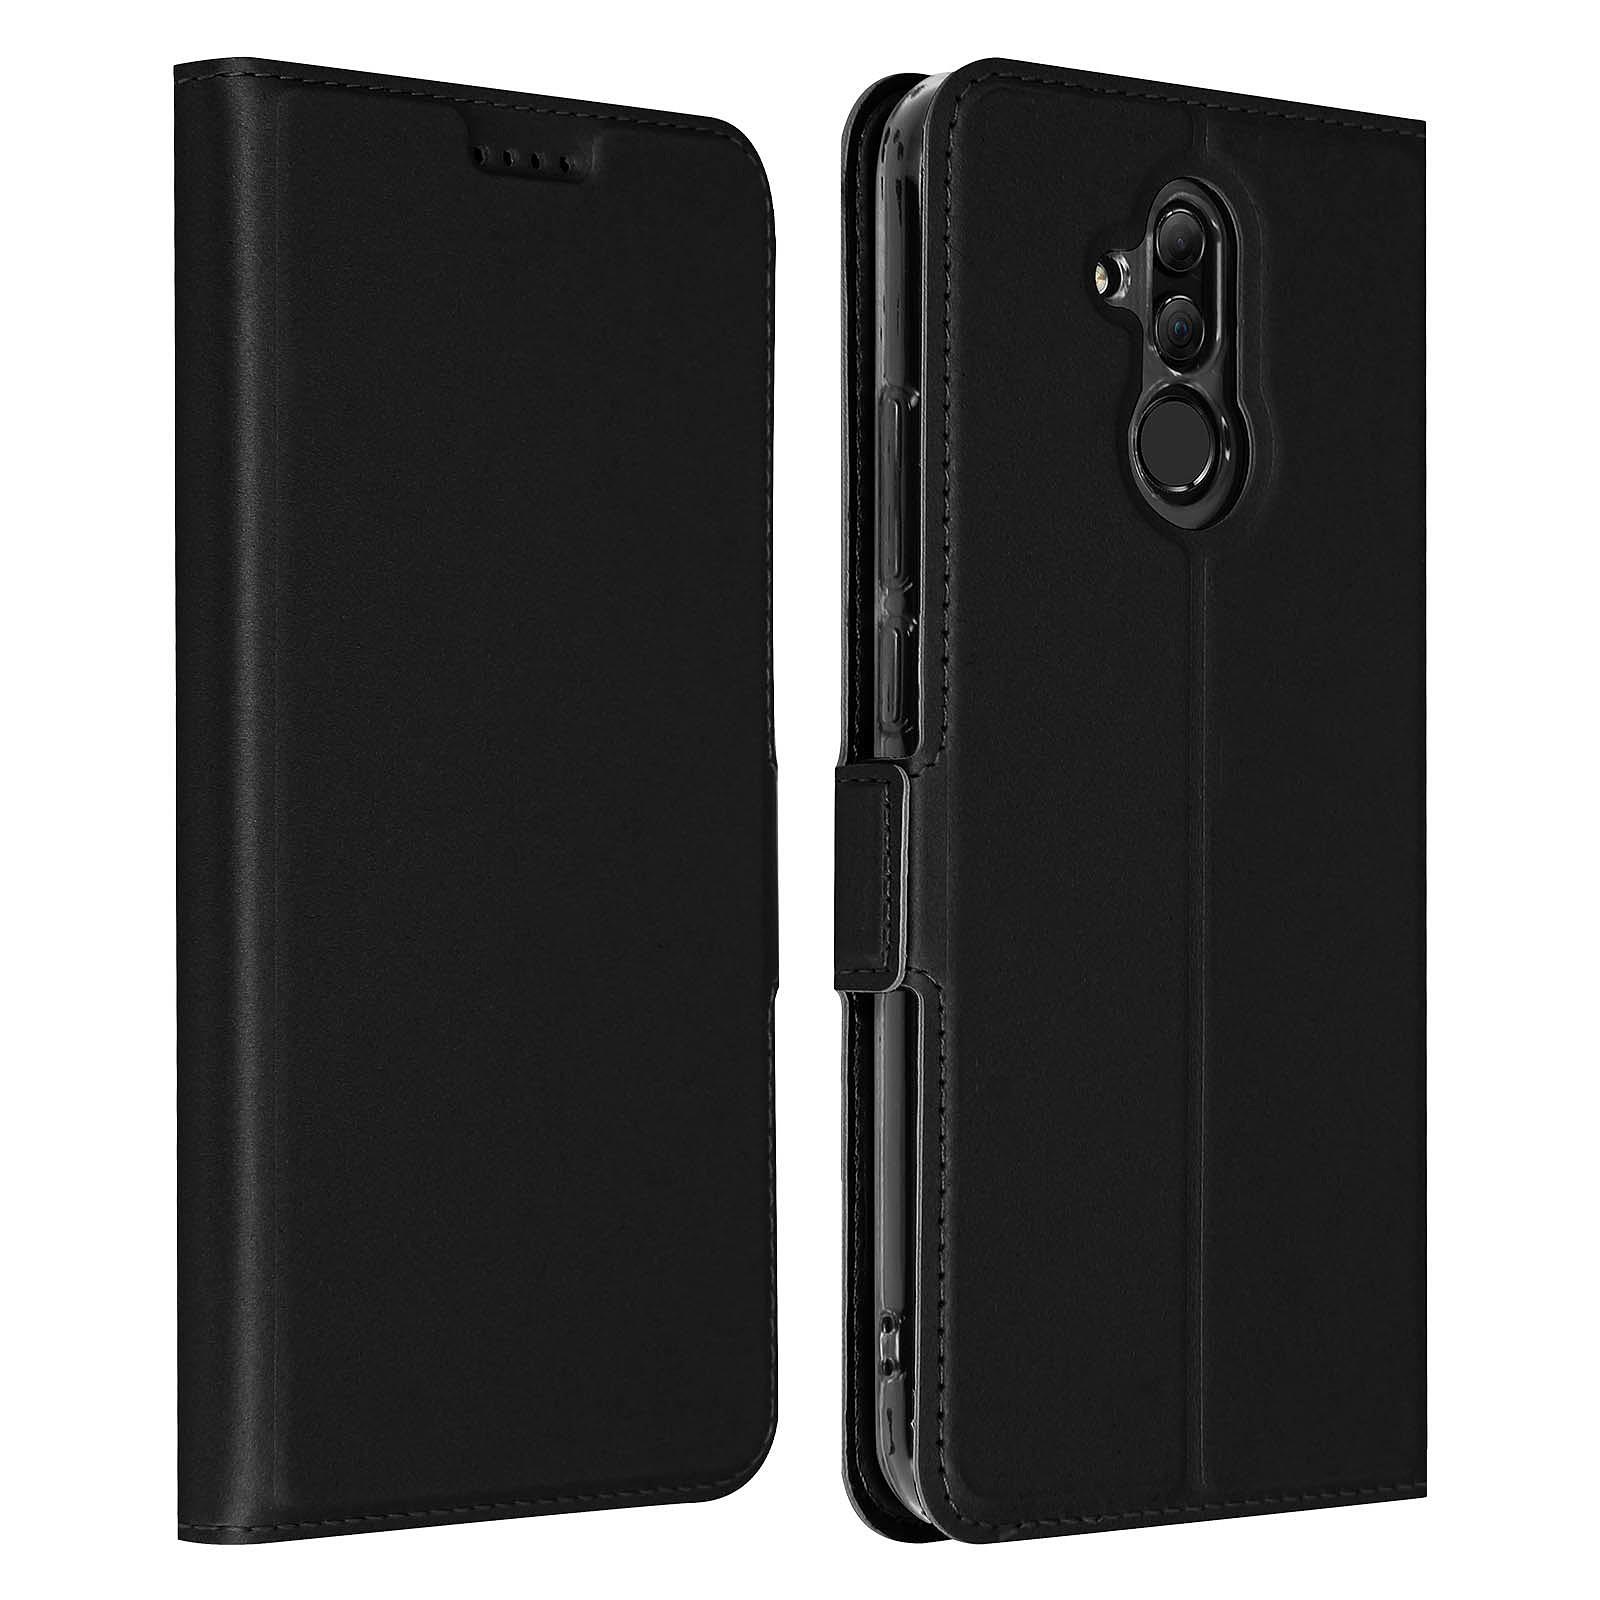 Avizar Etui folio Noir pour Huawei Mate 20 lite